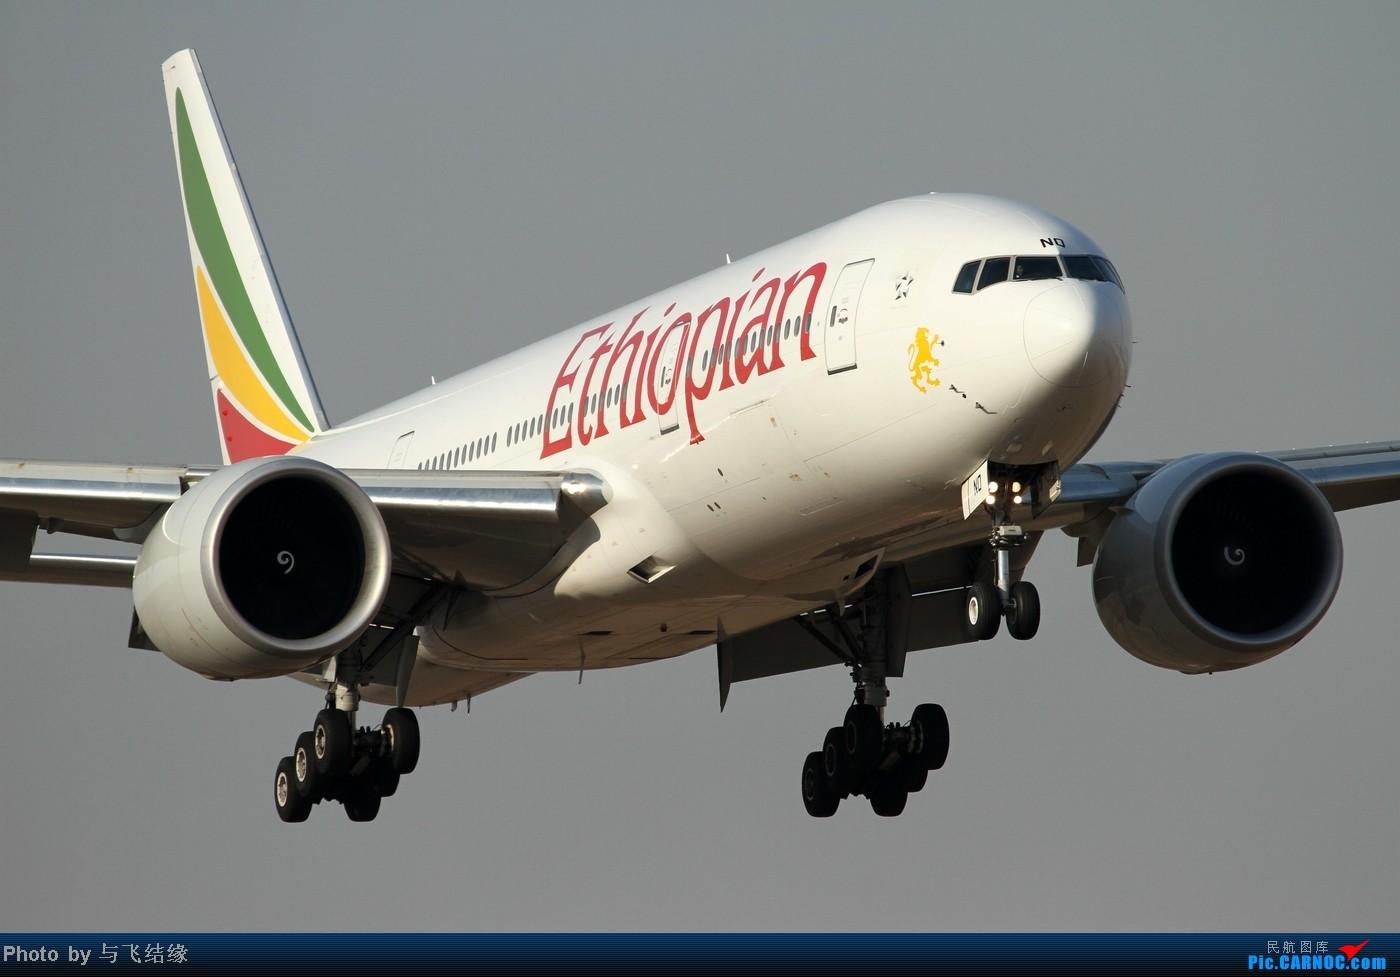 Re:[原创]喜欢777吗?九家航空公司的777大头近进照,777控们进来看看。 BOEING 777-200 ET-AND 中国北京首都机场